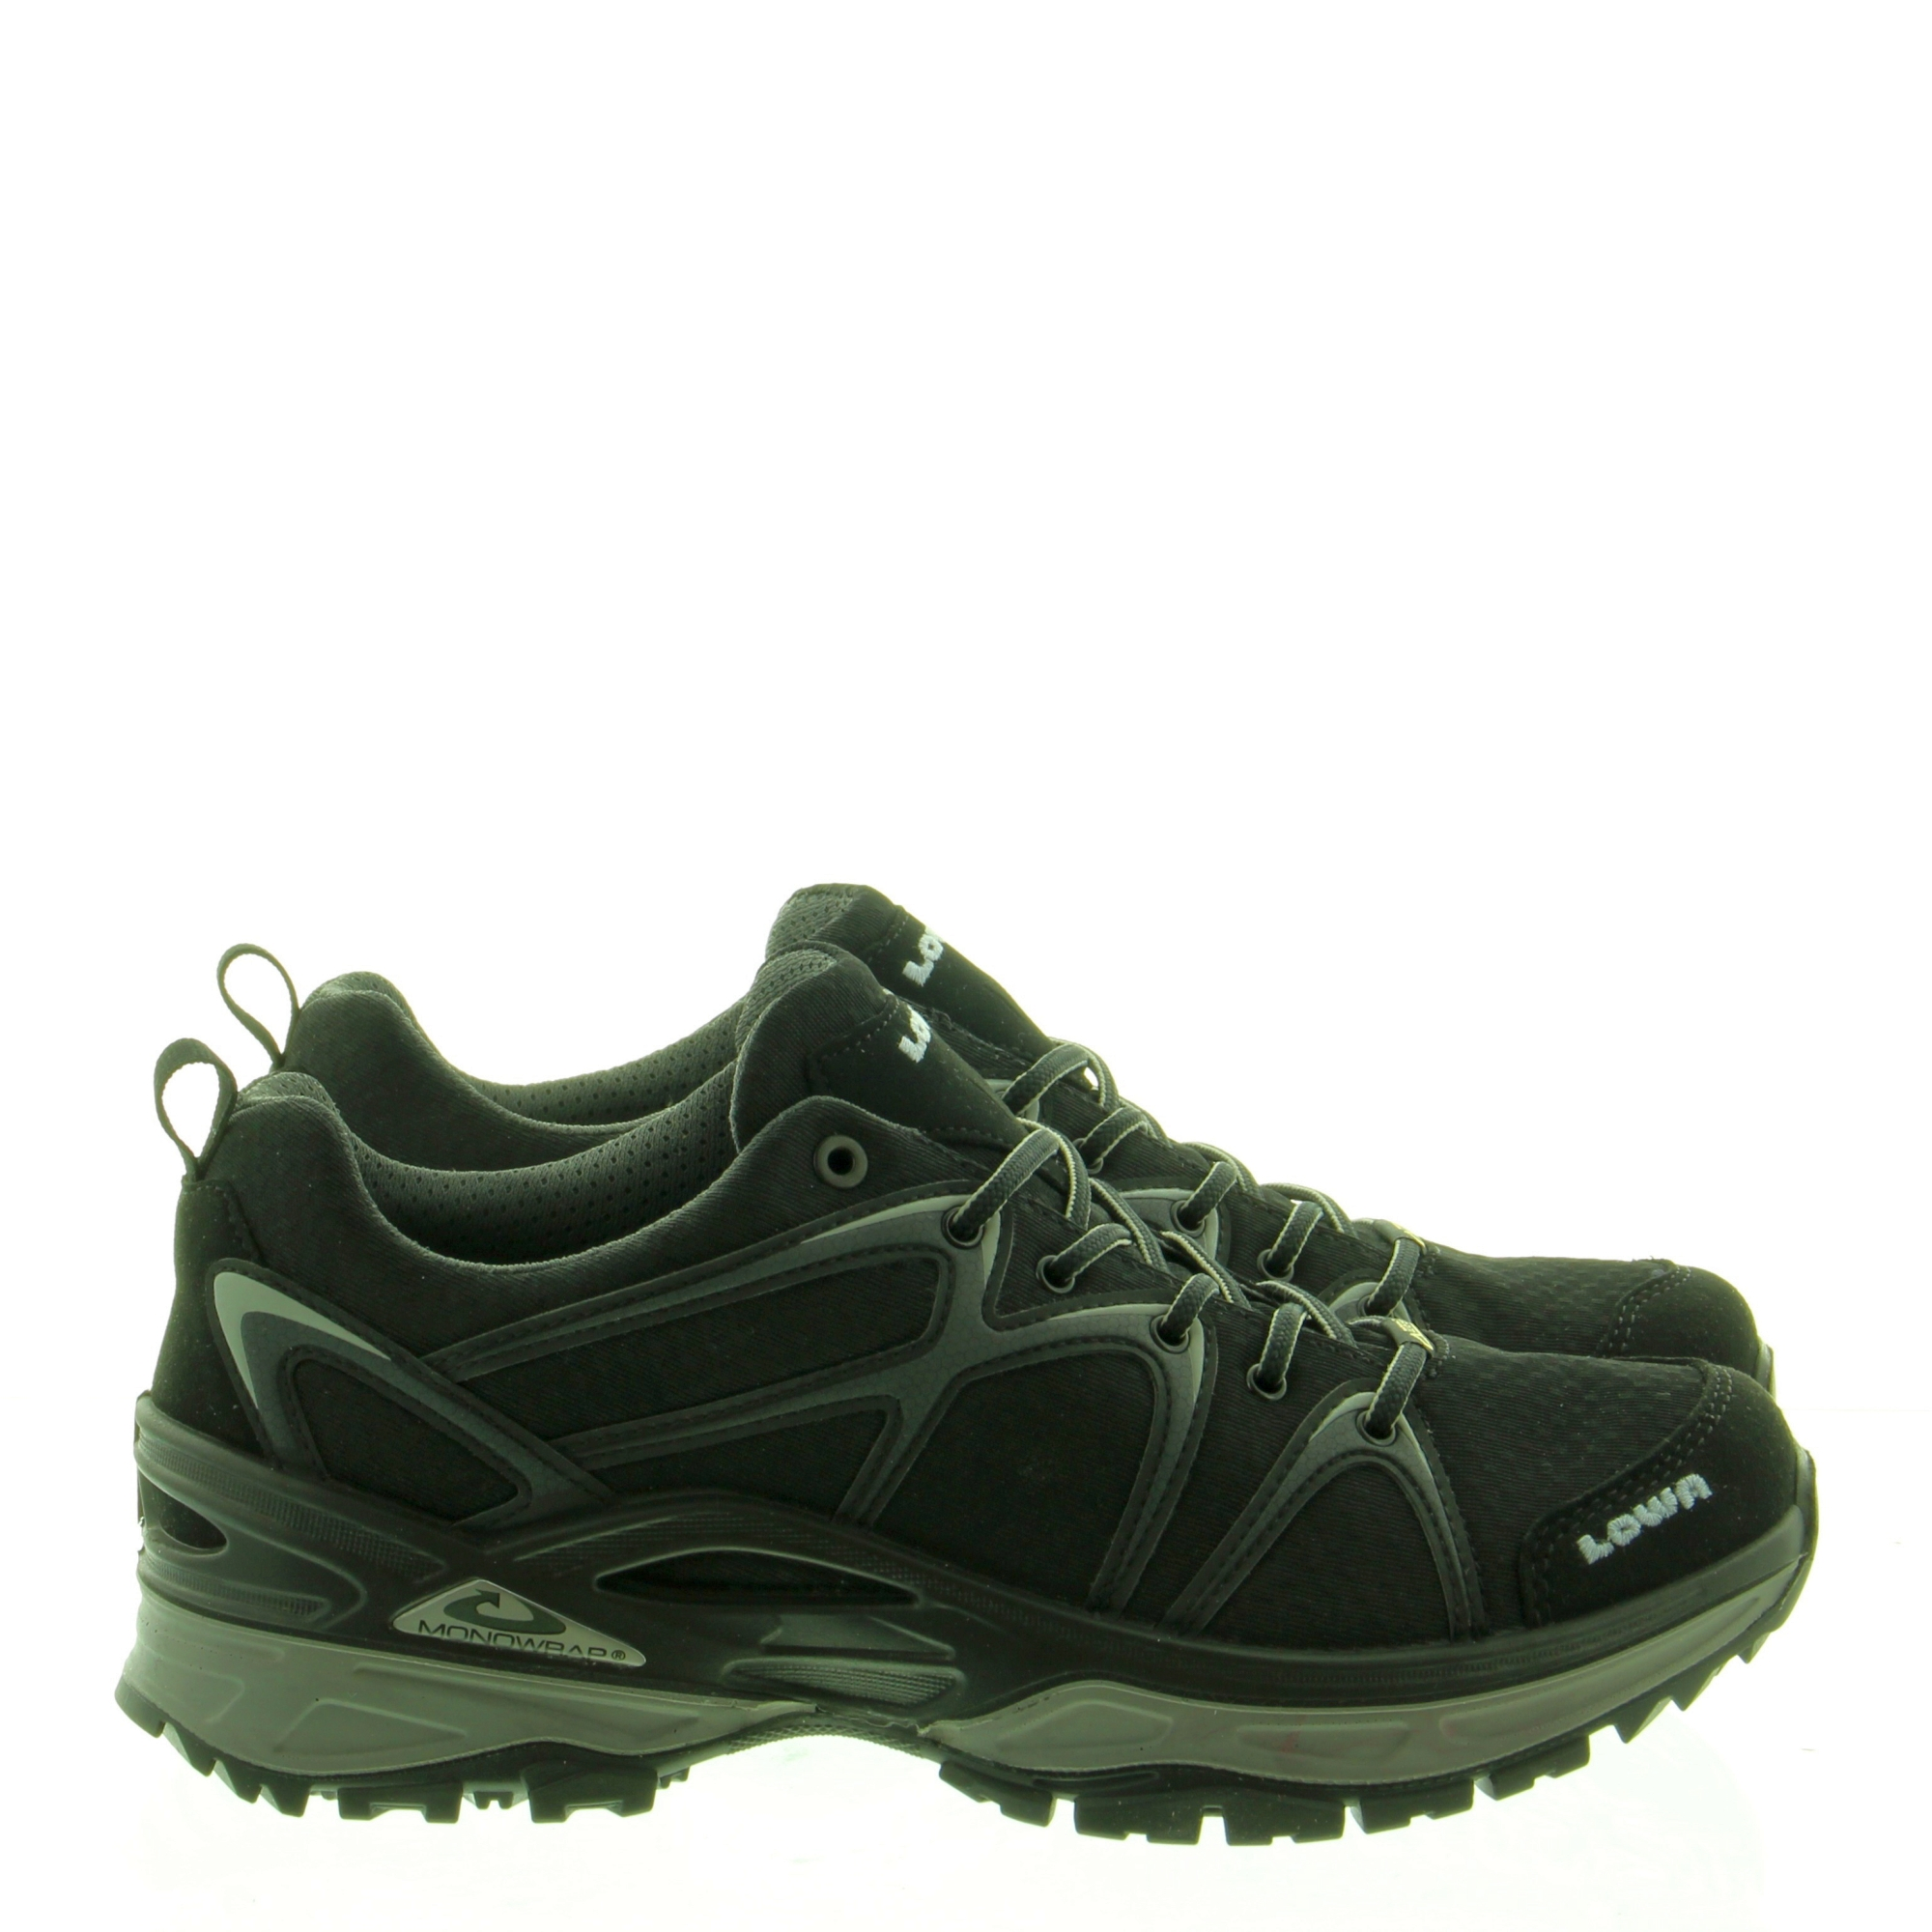 Lowa Innox GTX Low Men 310601 9930 Black Grey